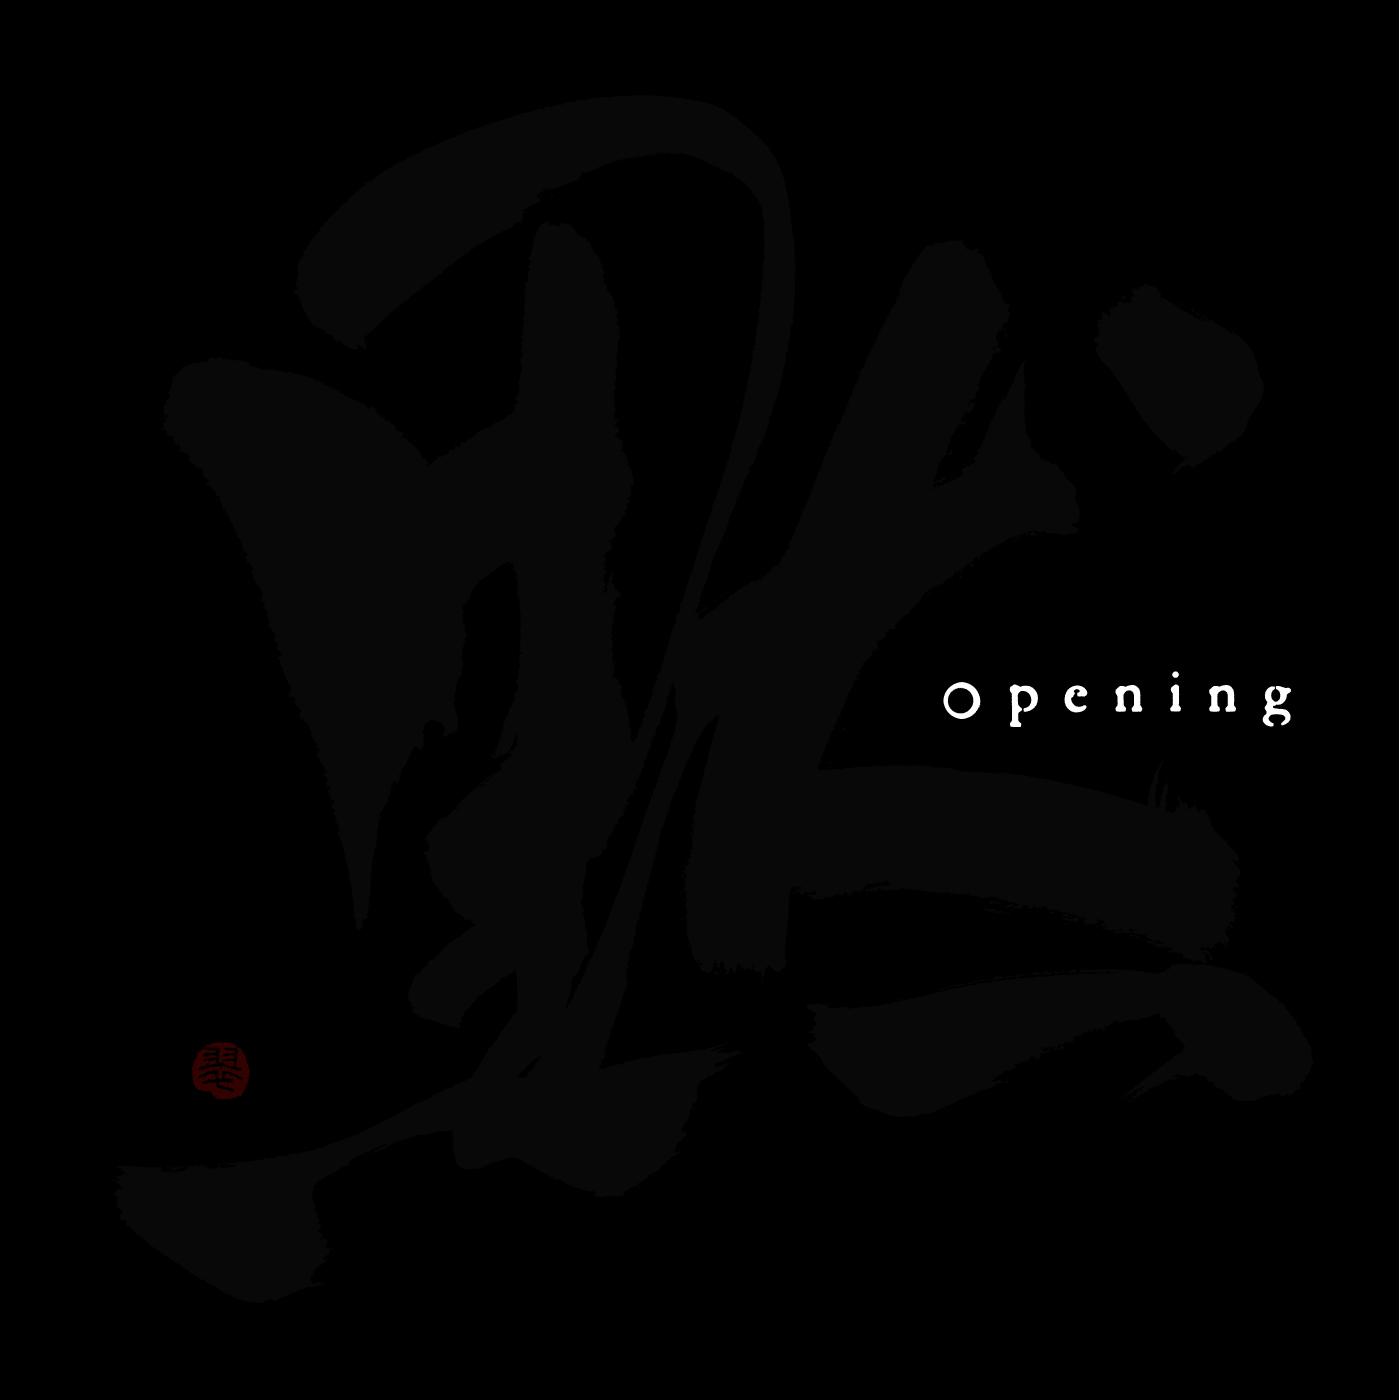 opening_h1_koi.jpg